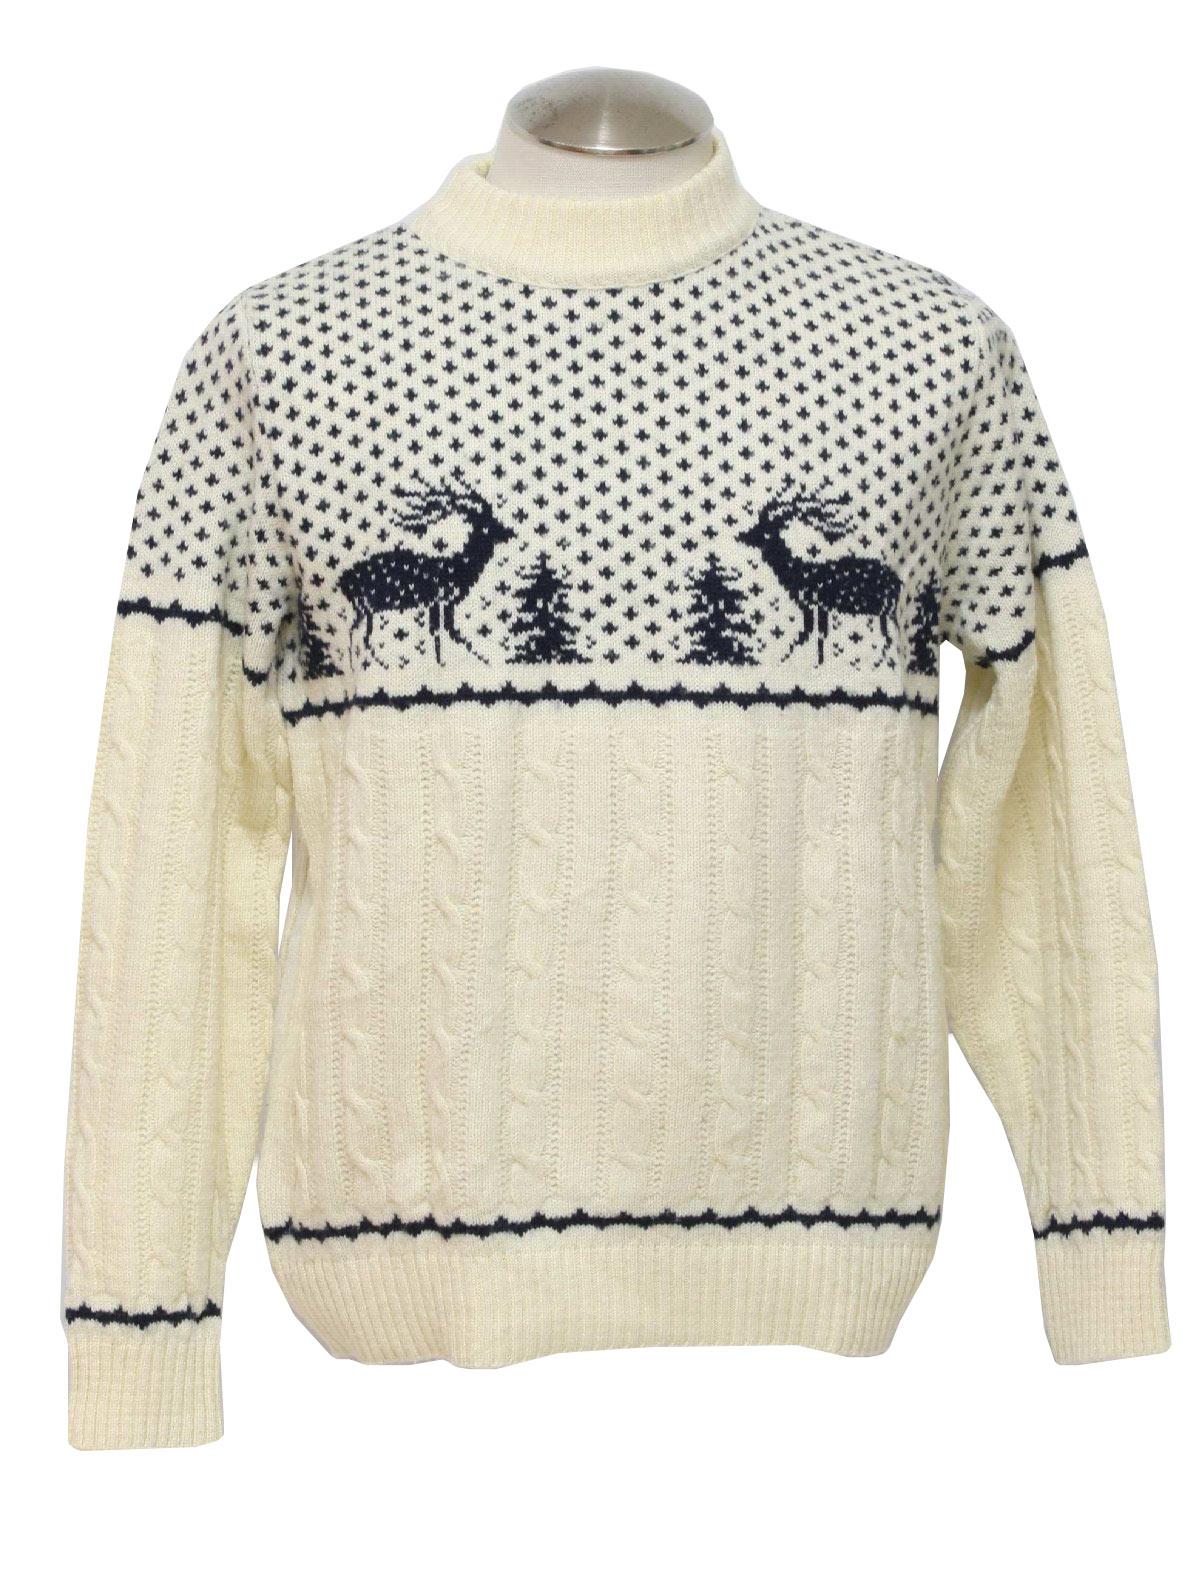 White Sweater Men Mens Reindeer Ski Sweater